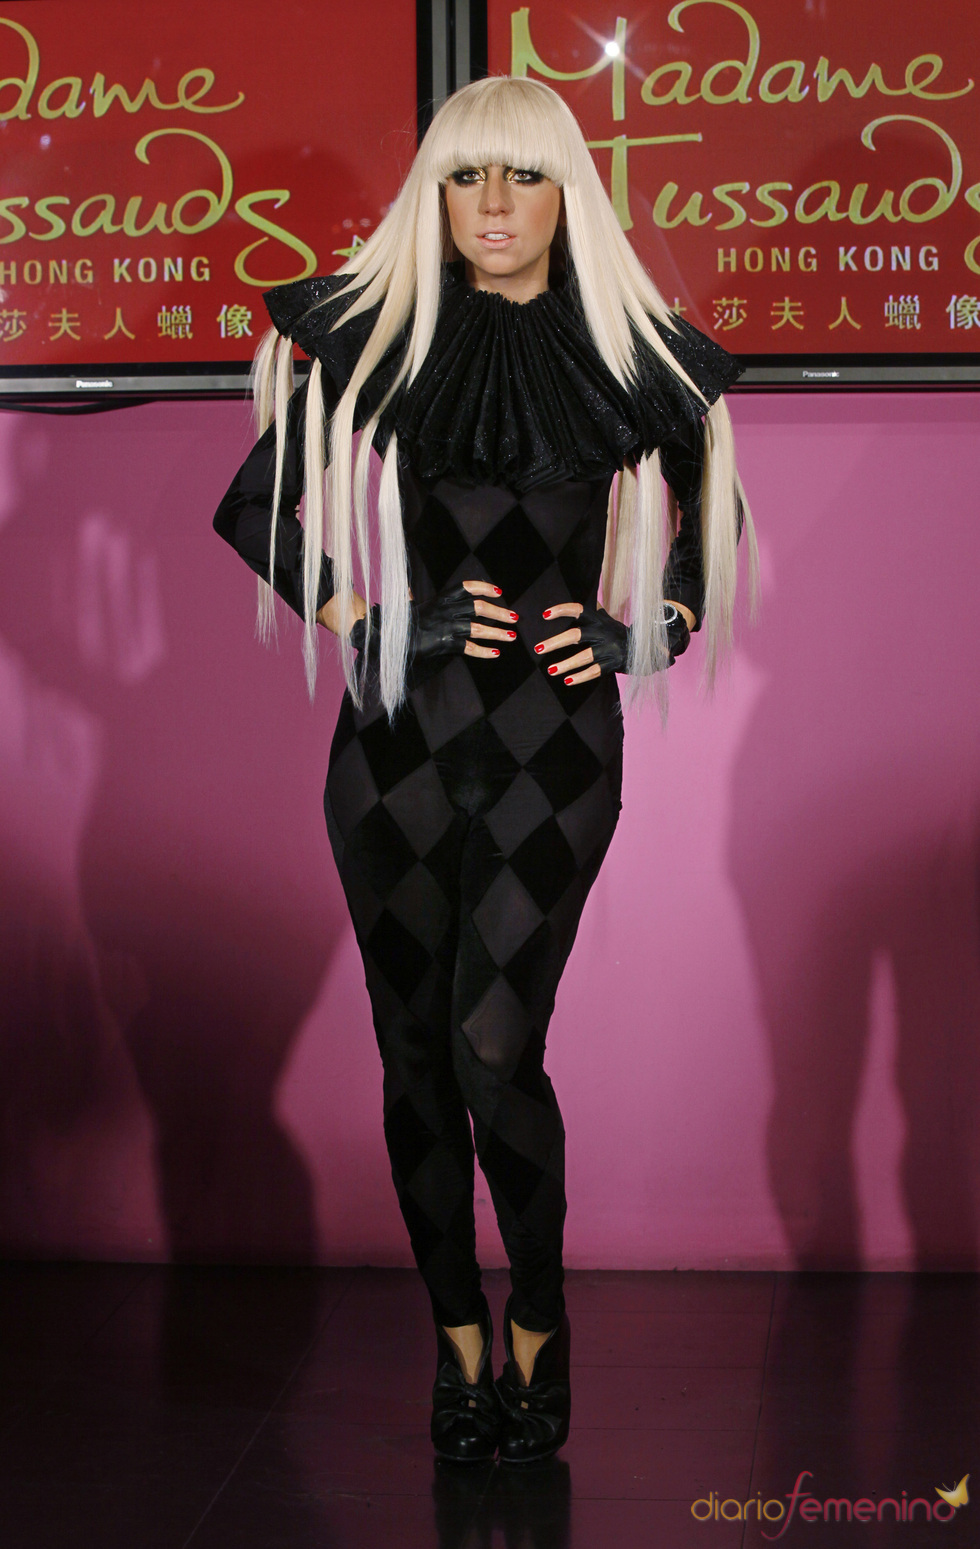 Figura de cera de Lady Gaga en Hong Kong